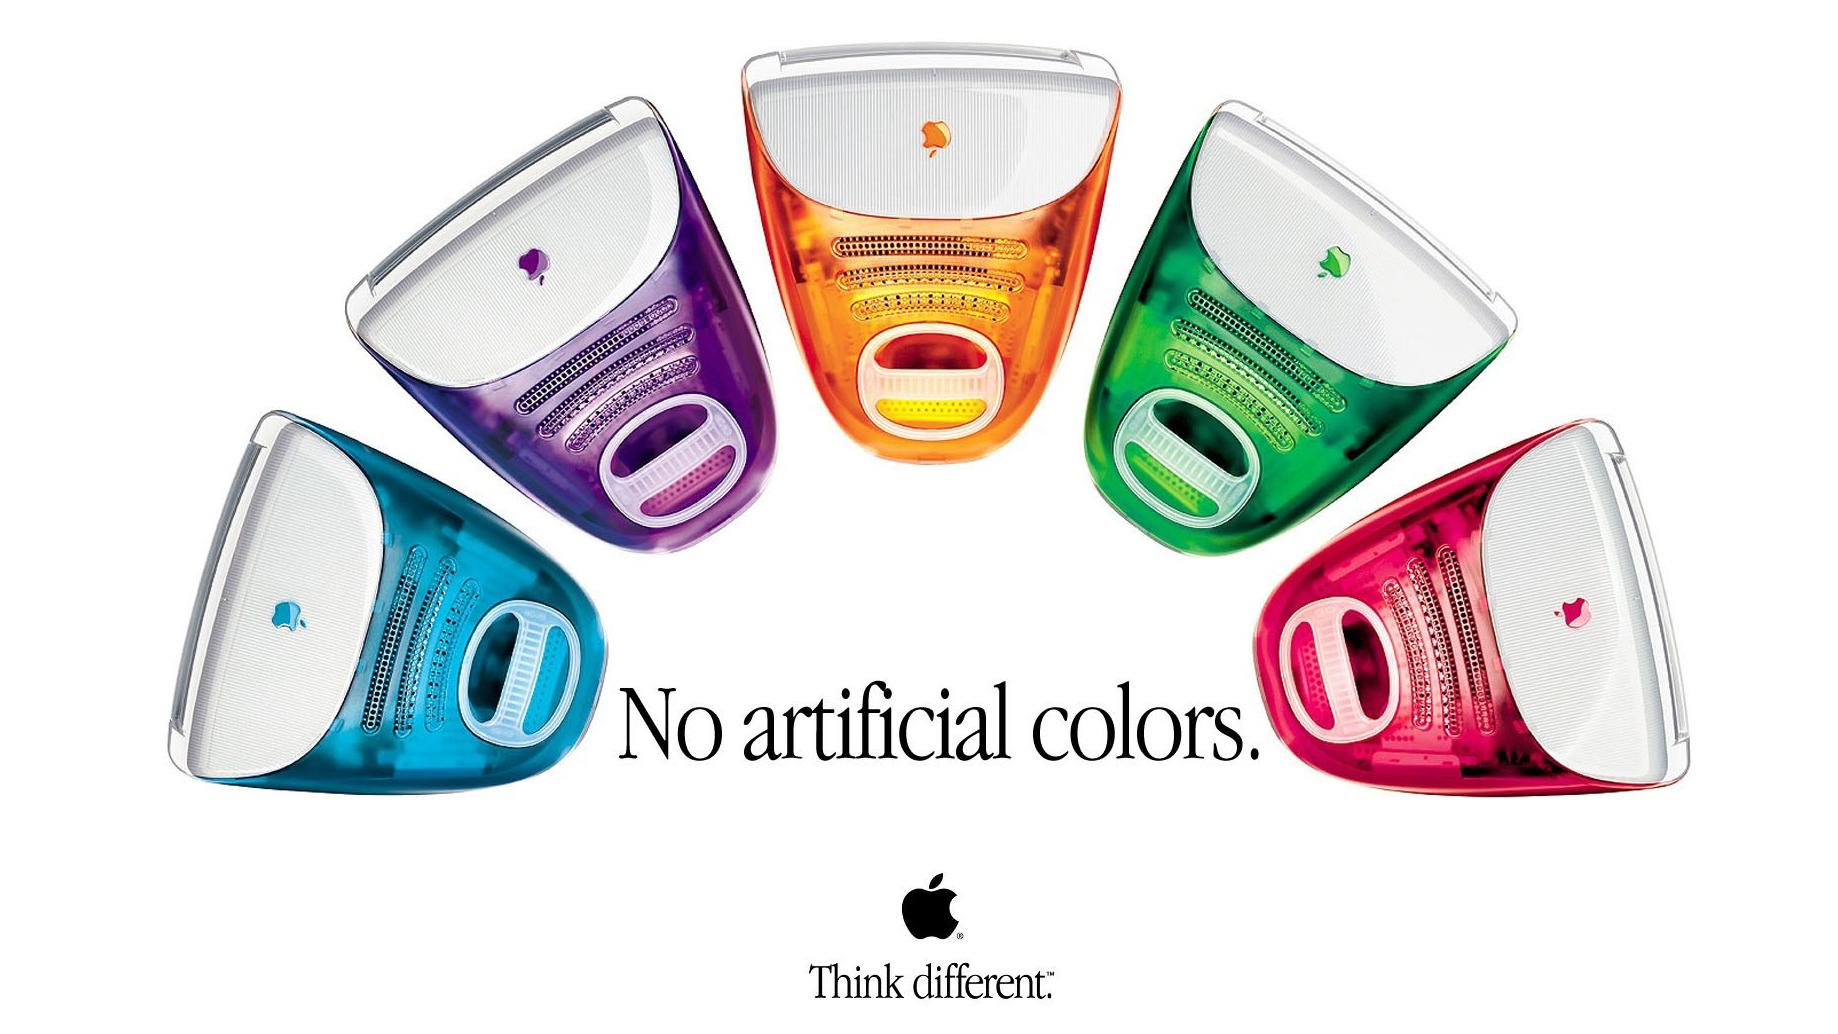 imac-artificial-colors.png